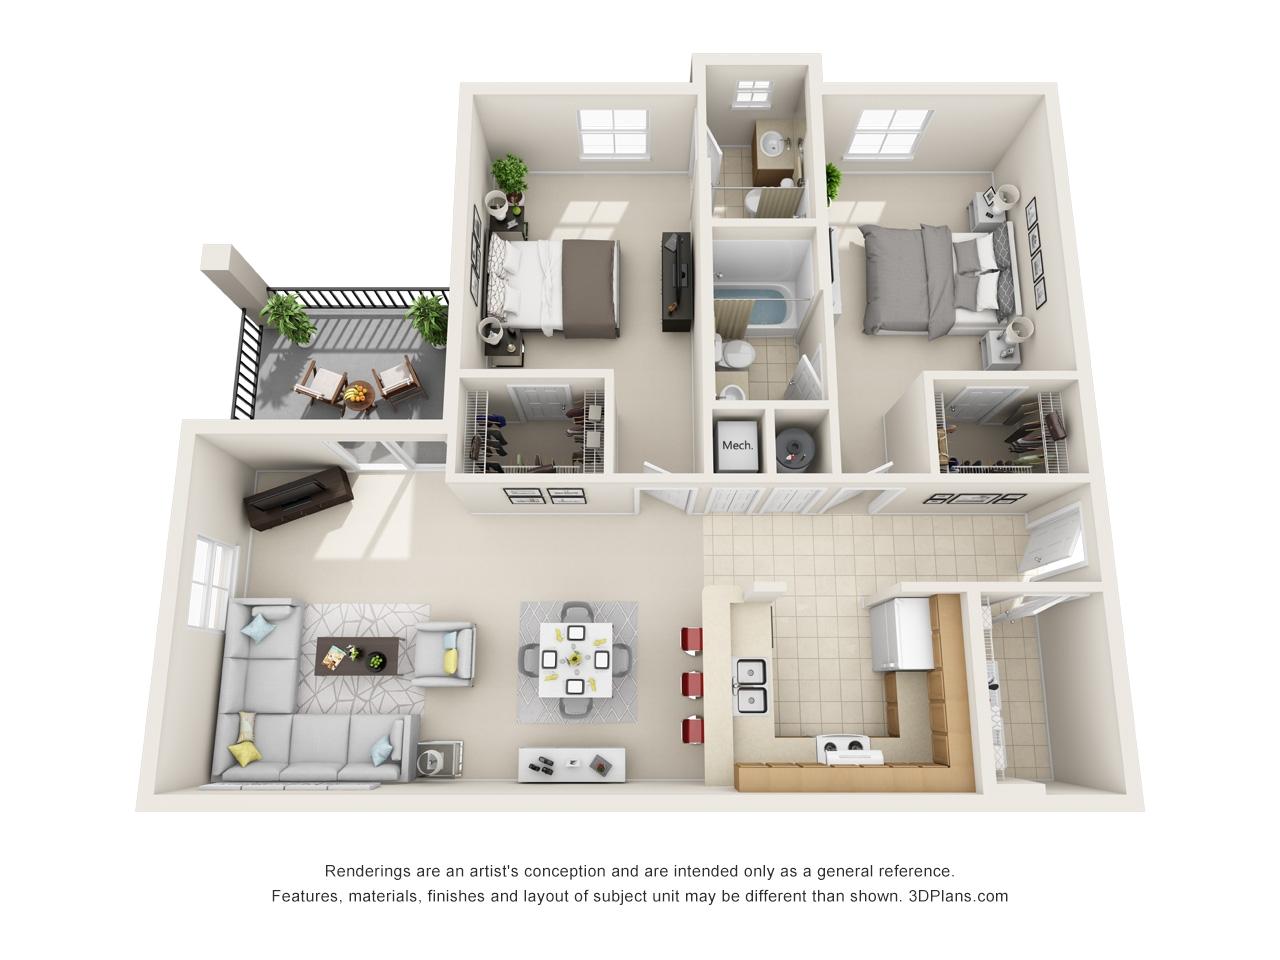 3 Bedroom 2 Bath Apartments for Rent In orlando Fl 2 Bed 2 Bath